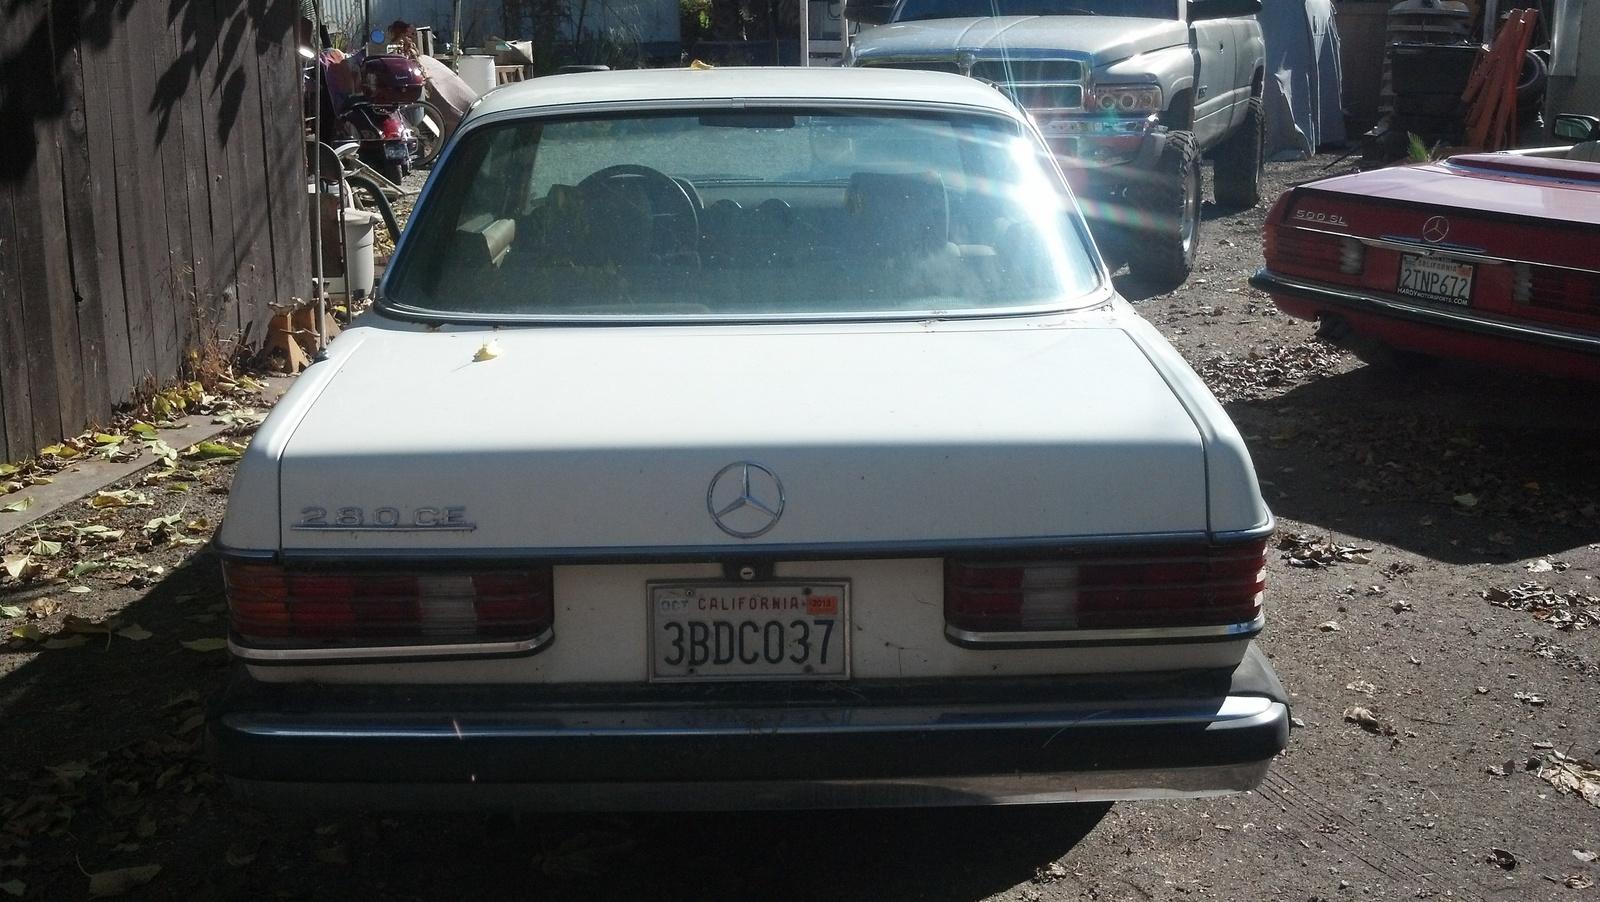 1980 mercedes benz 280 overview cargurus for Mercedes benz 1980